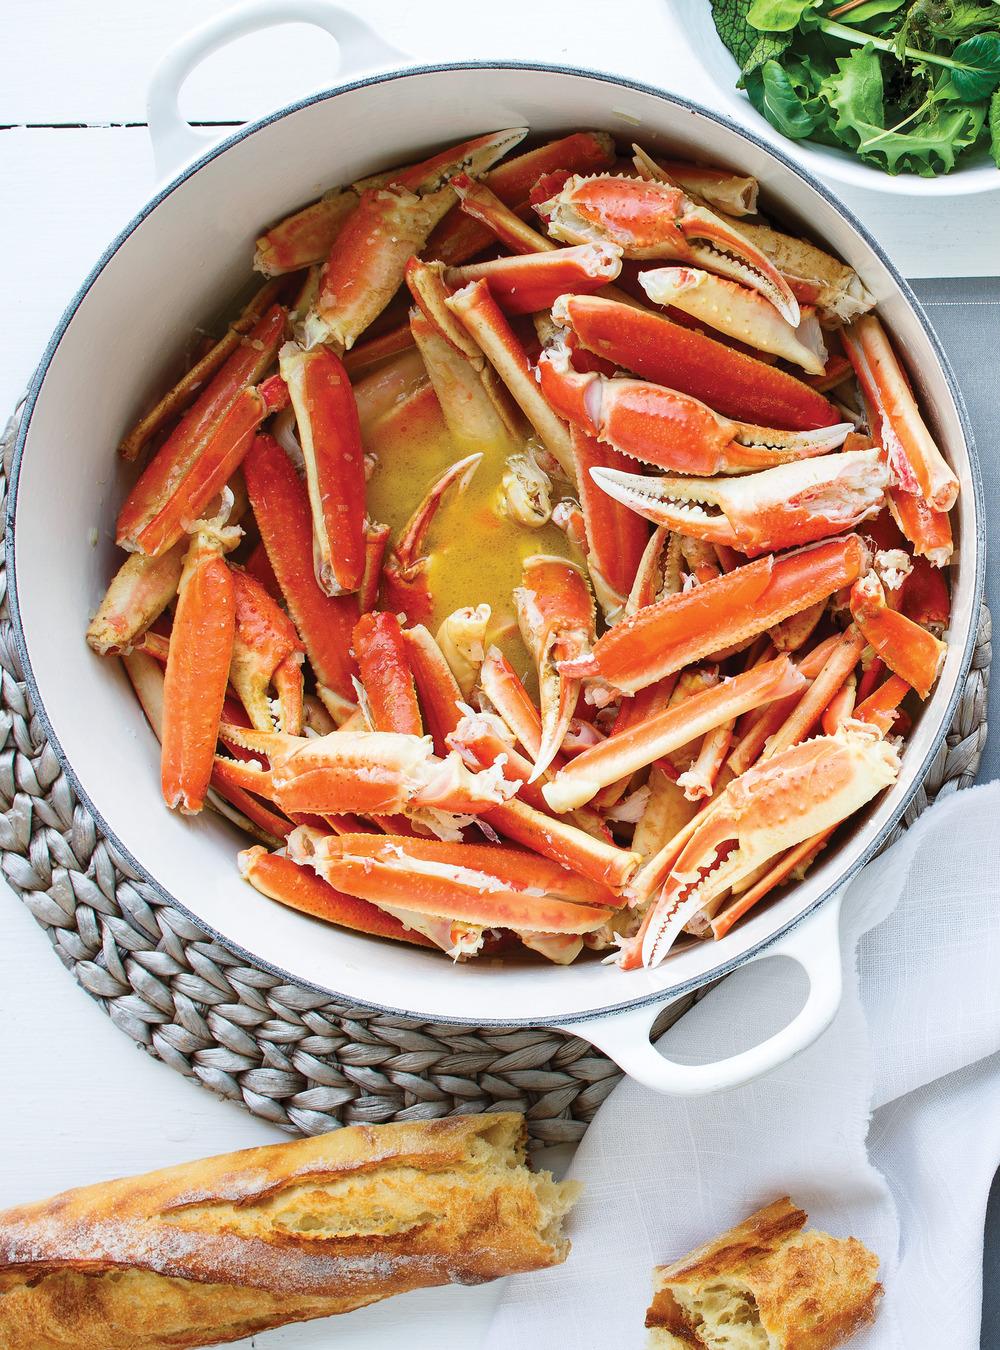 Crabe chaud au beurre | ricardo